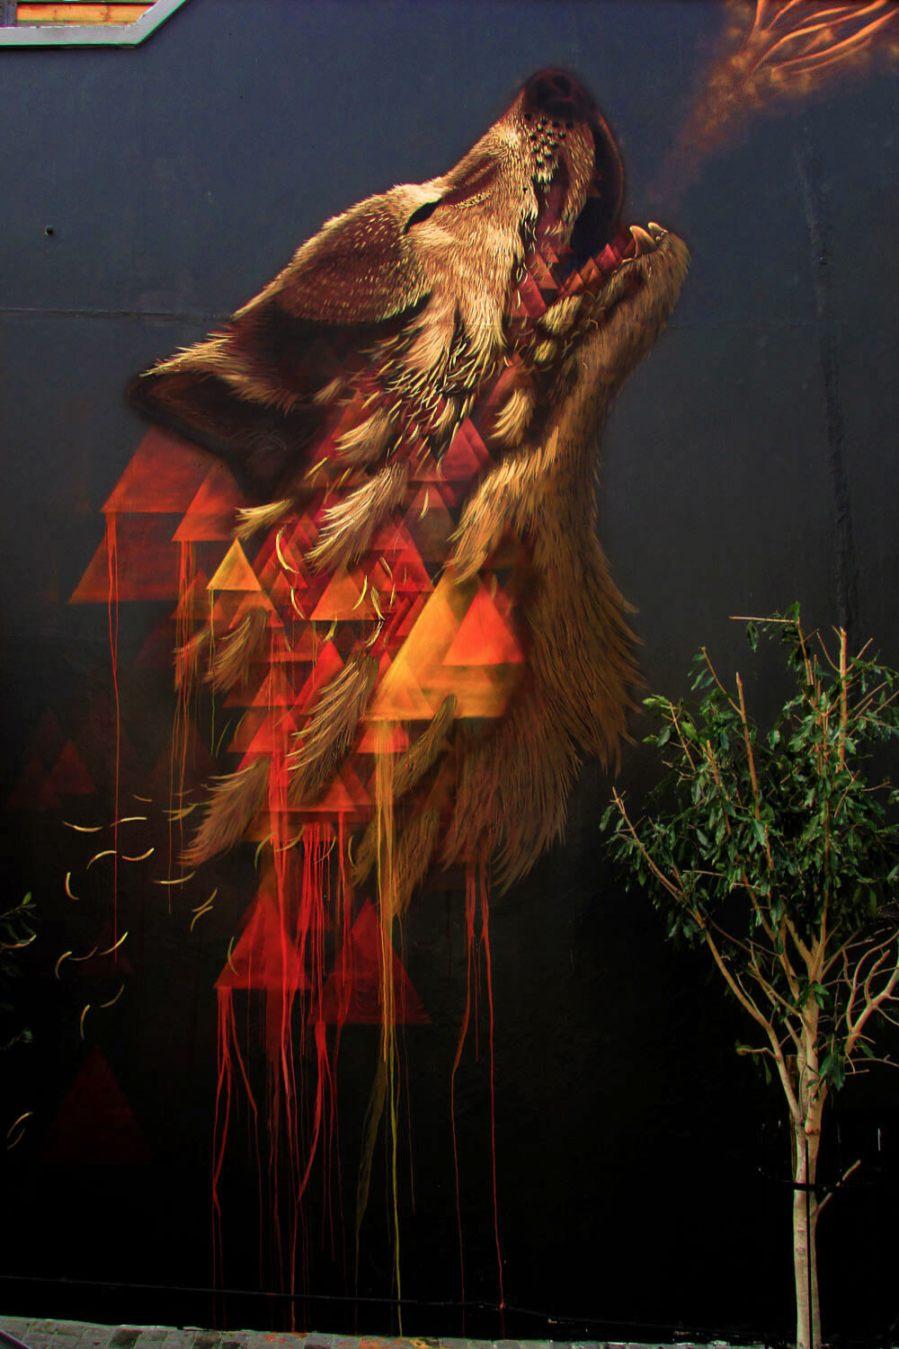 Sonny, The Buitengraght Wolf, Cape Town. Photo Credit Sonny